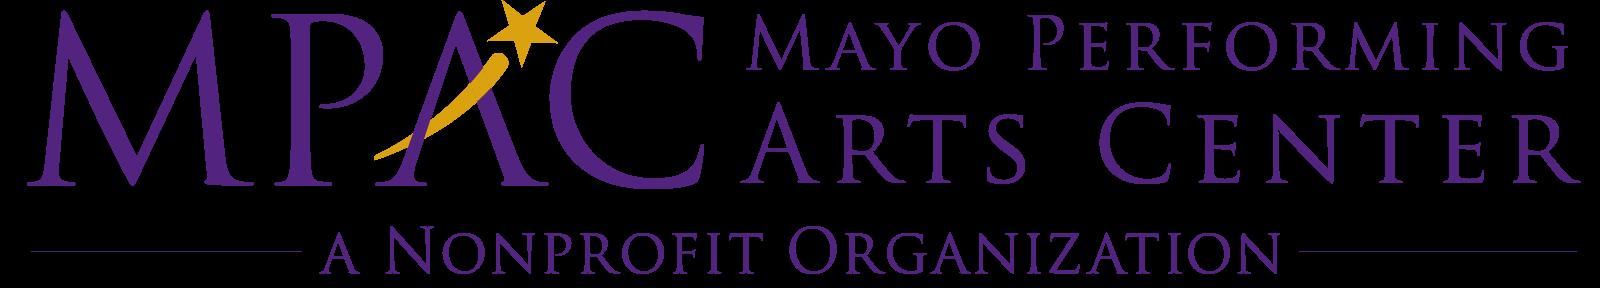 John Fogerty | Mayo Performing Arts Center